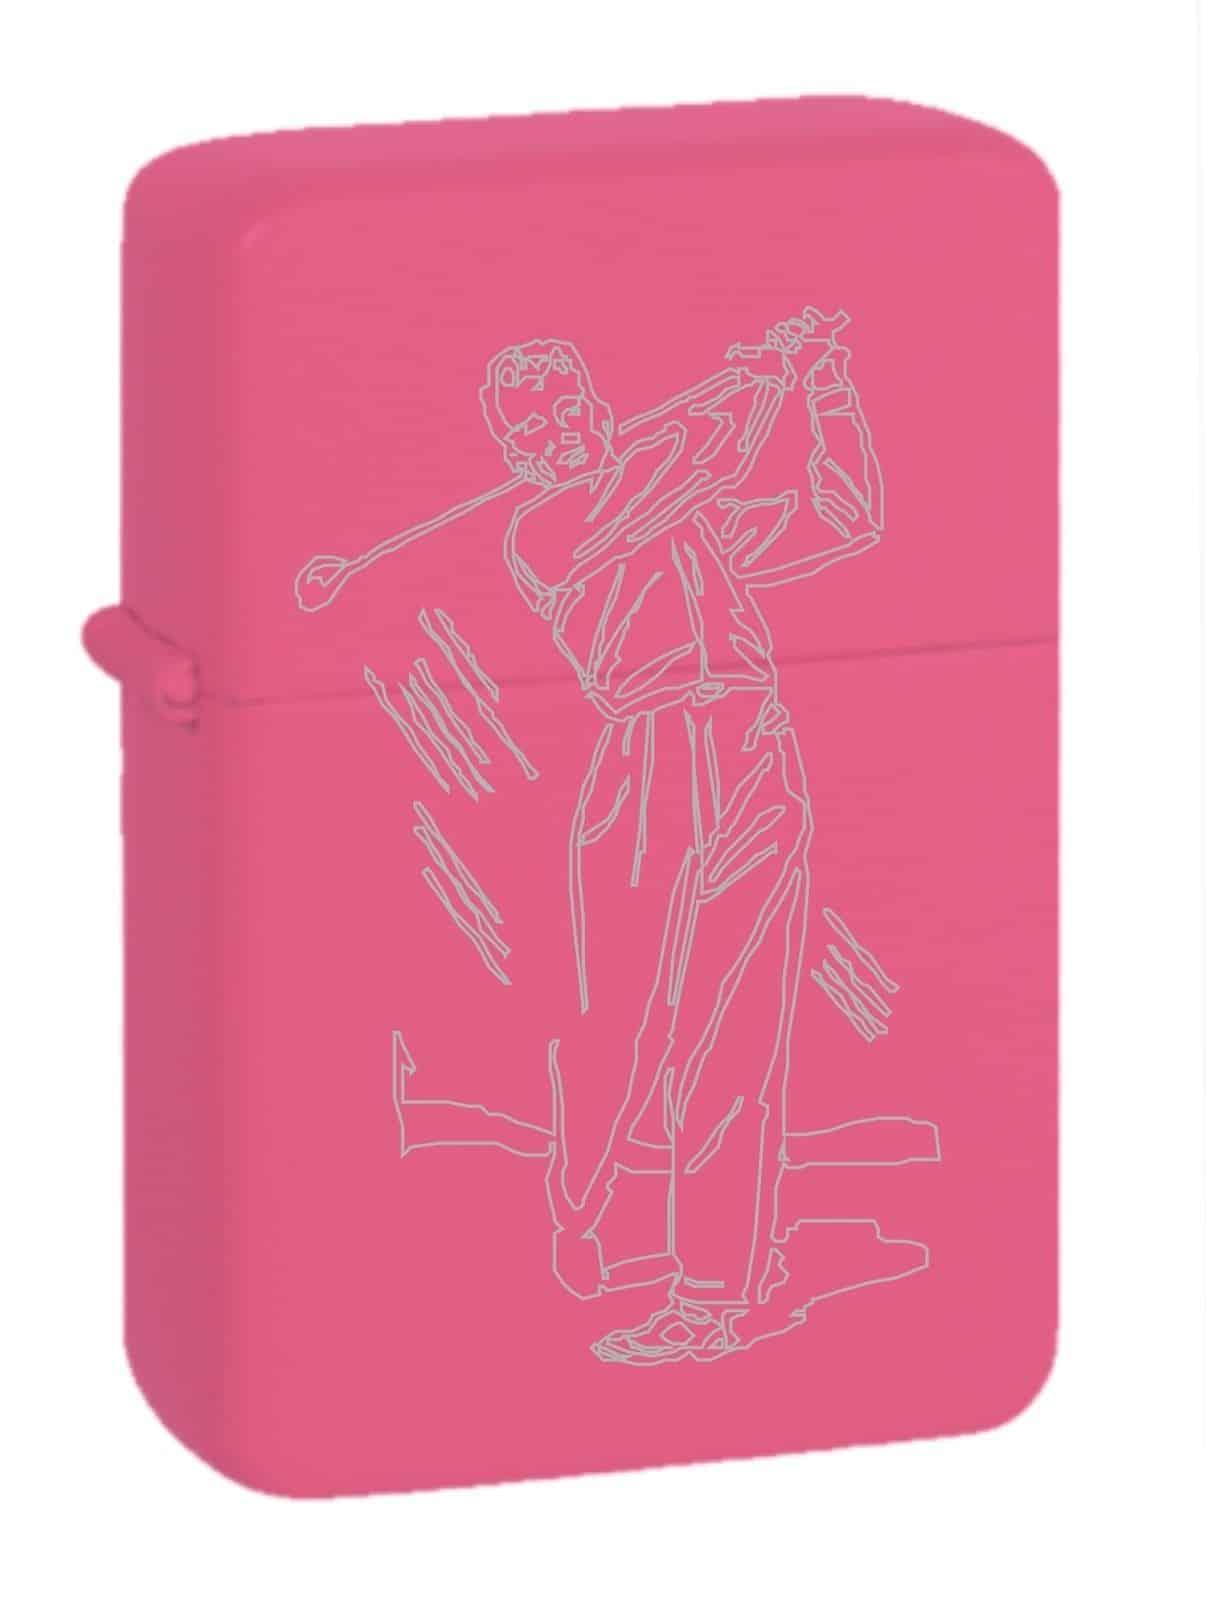 golfer-pink